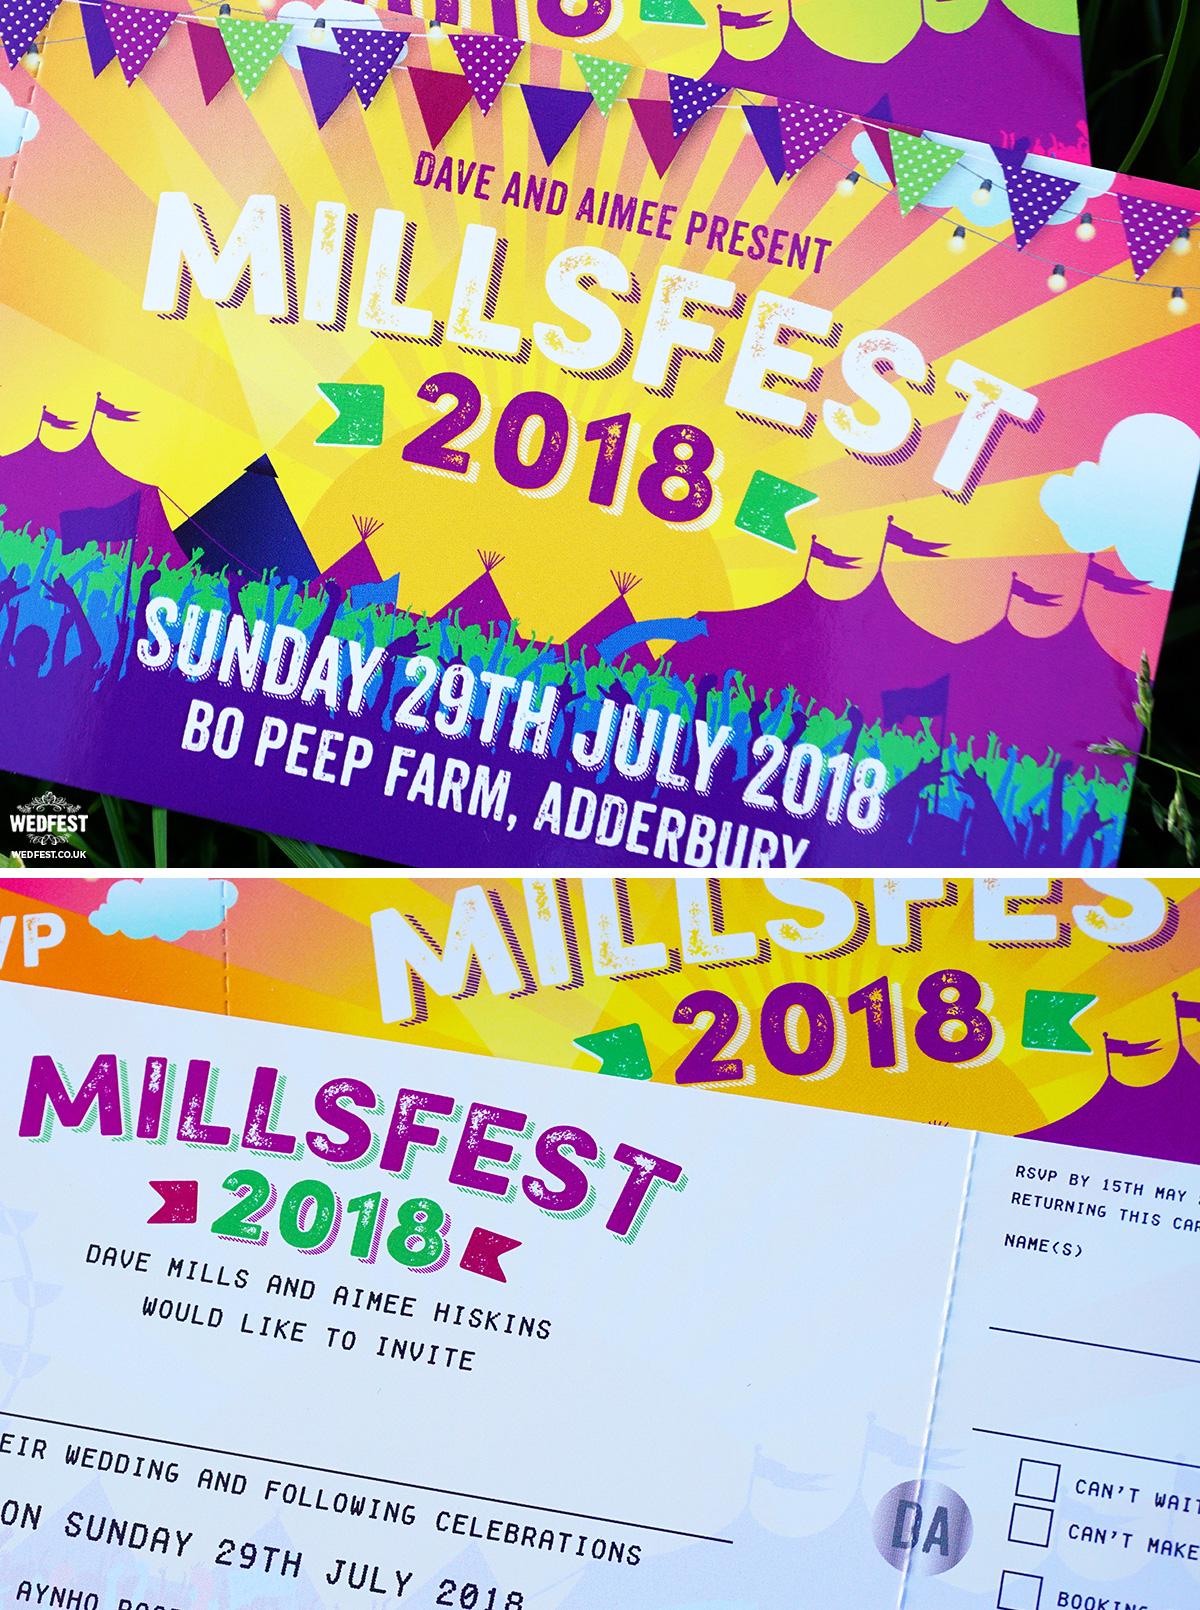 millsfest festival wedding-invites bo peep farm adderbury